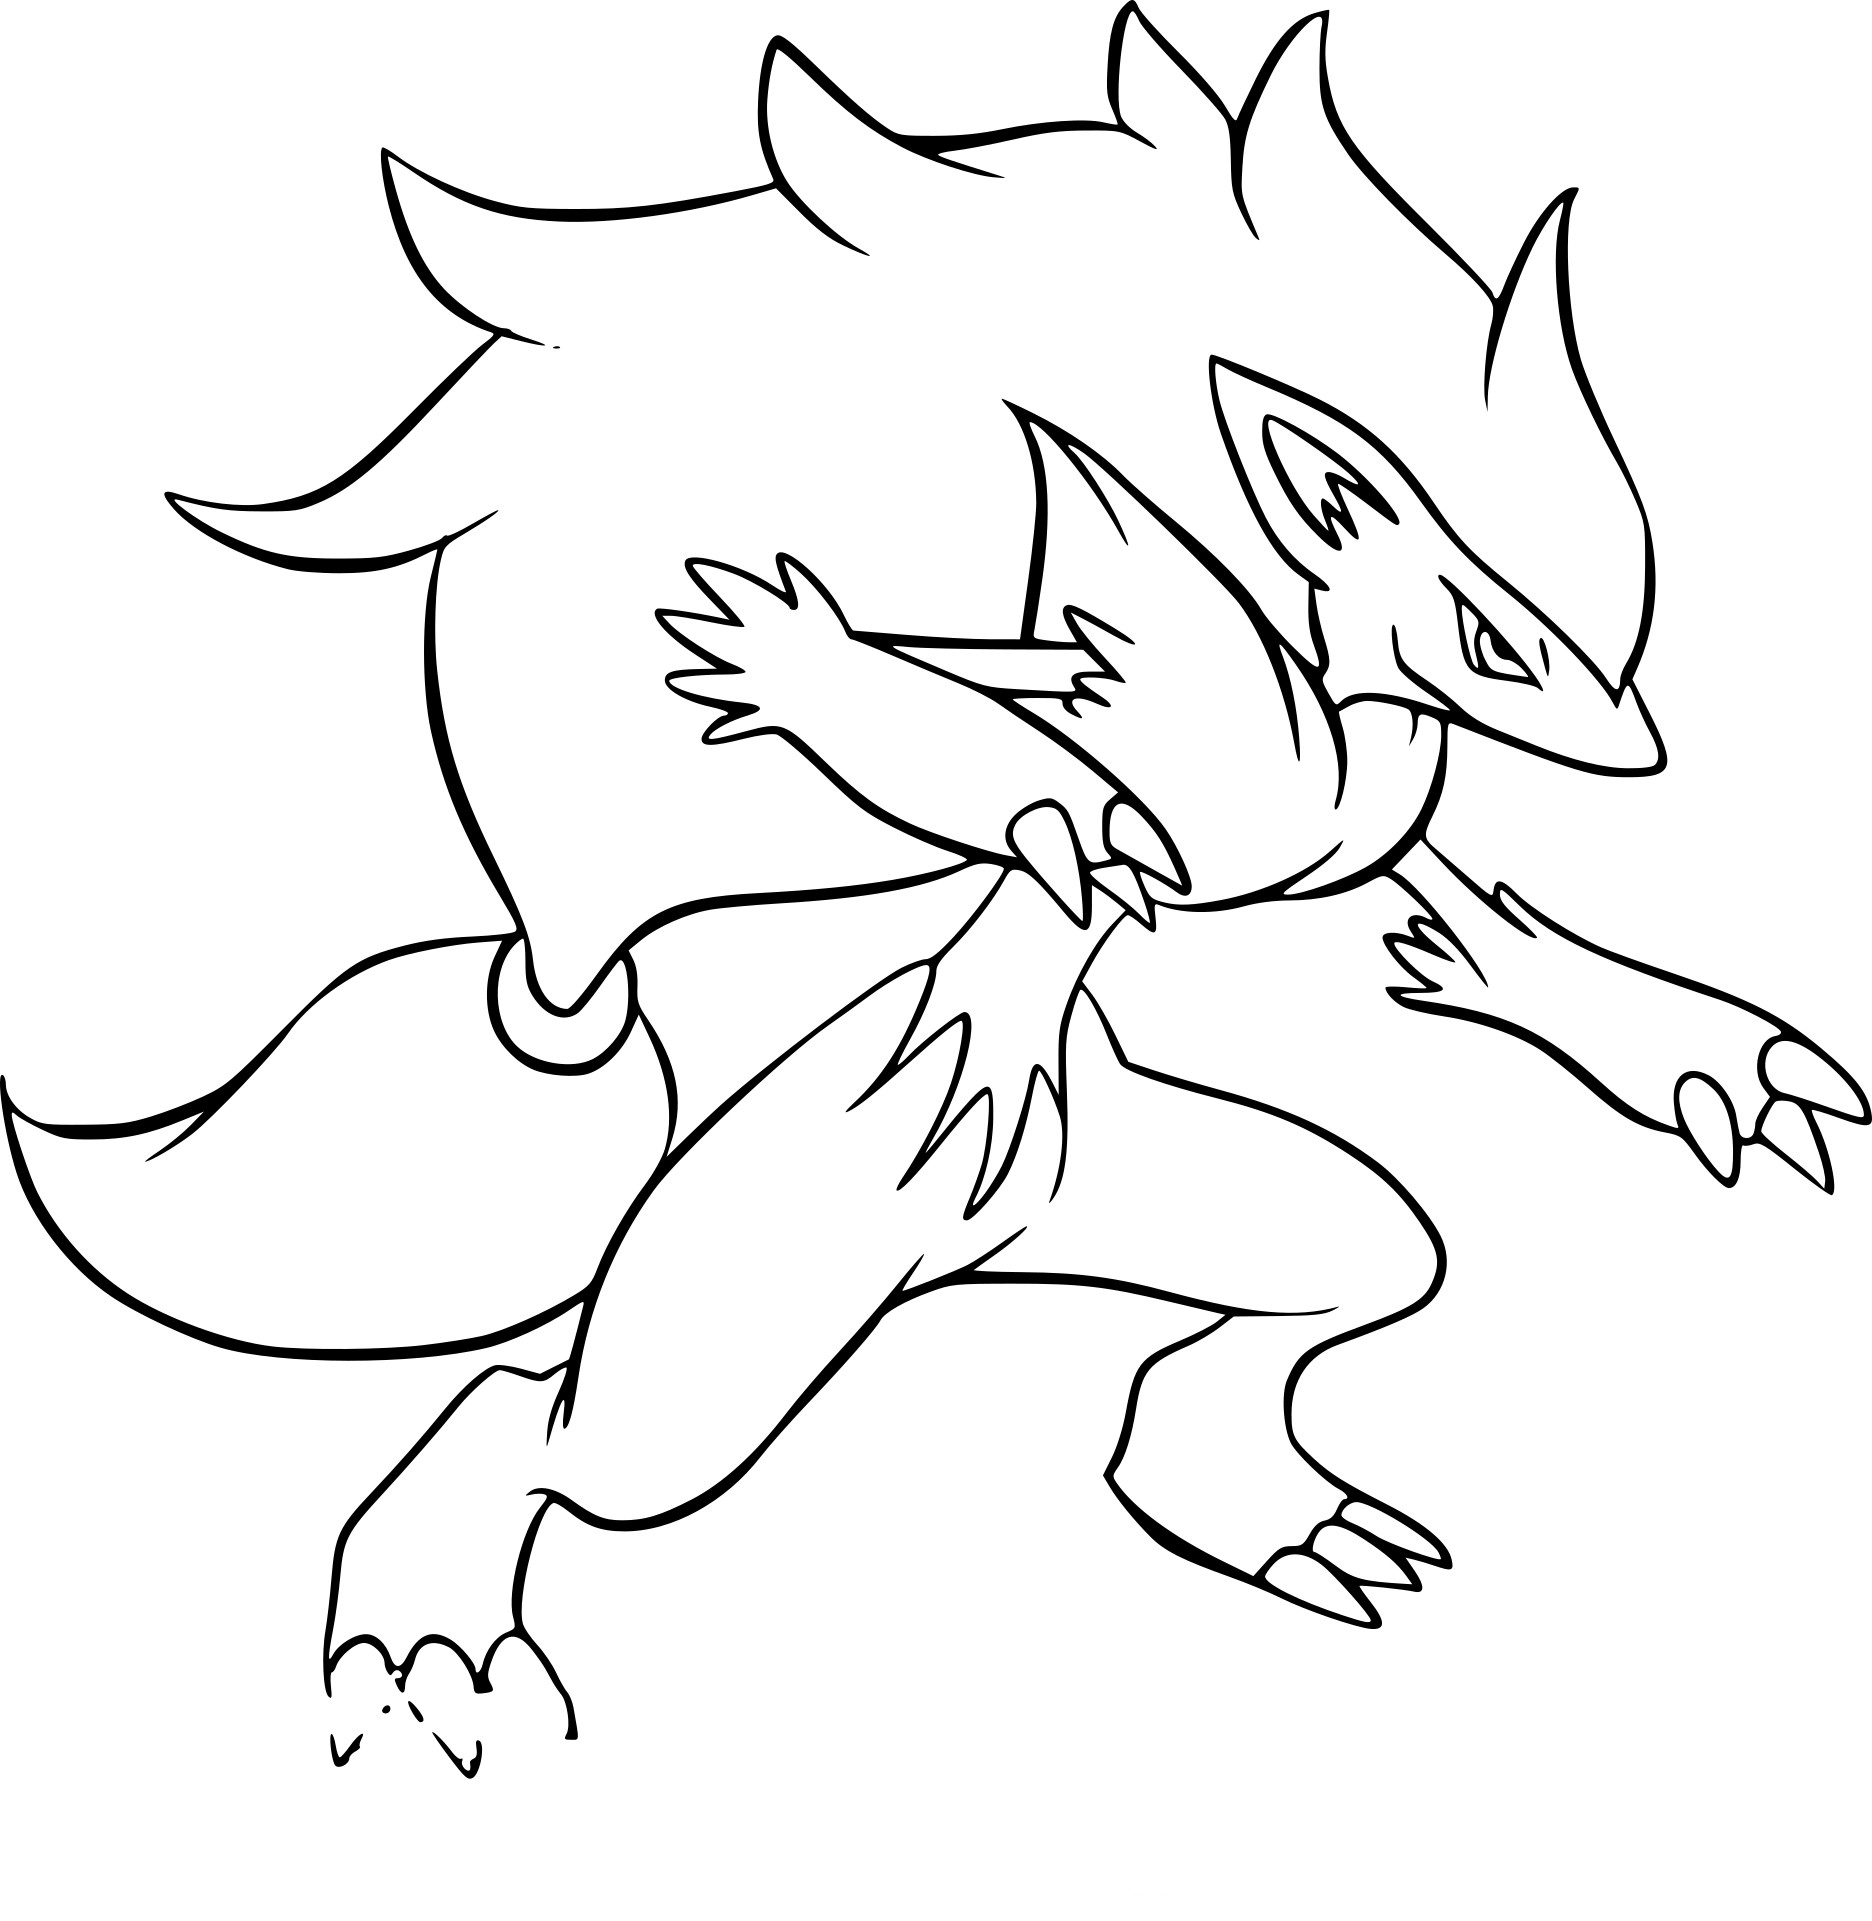 Coloriage Drascore Pokemon à Imprimer